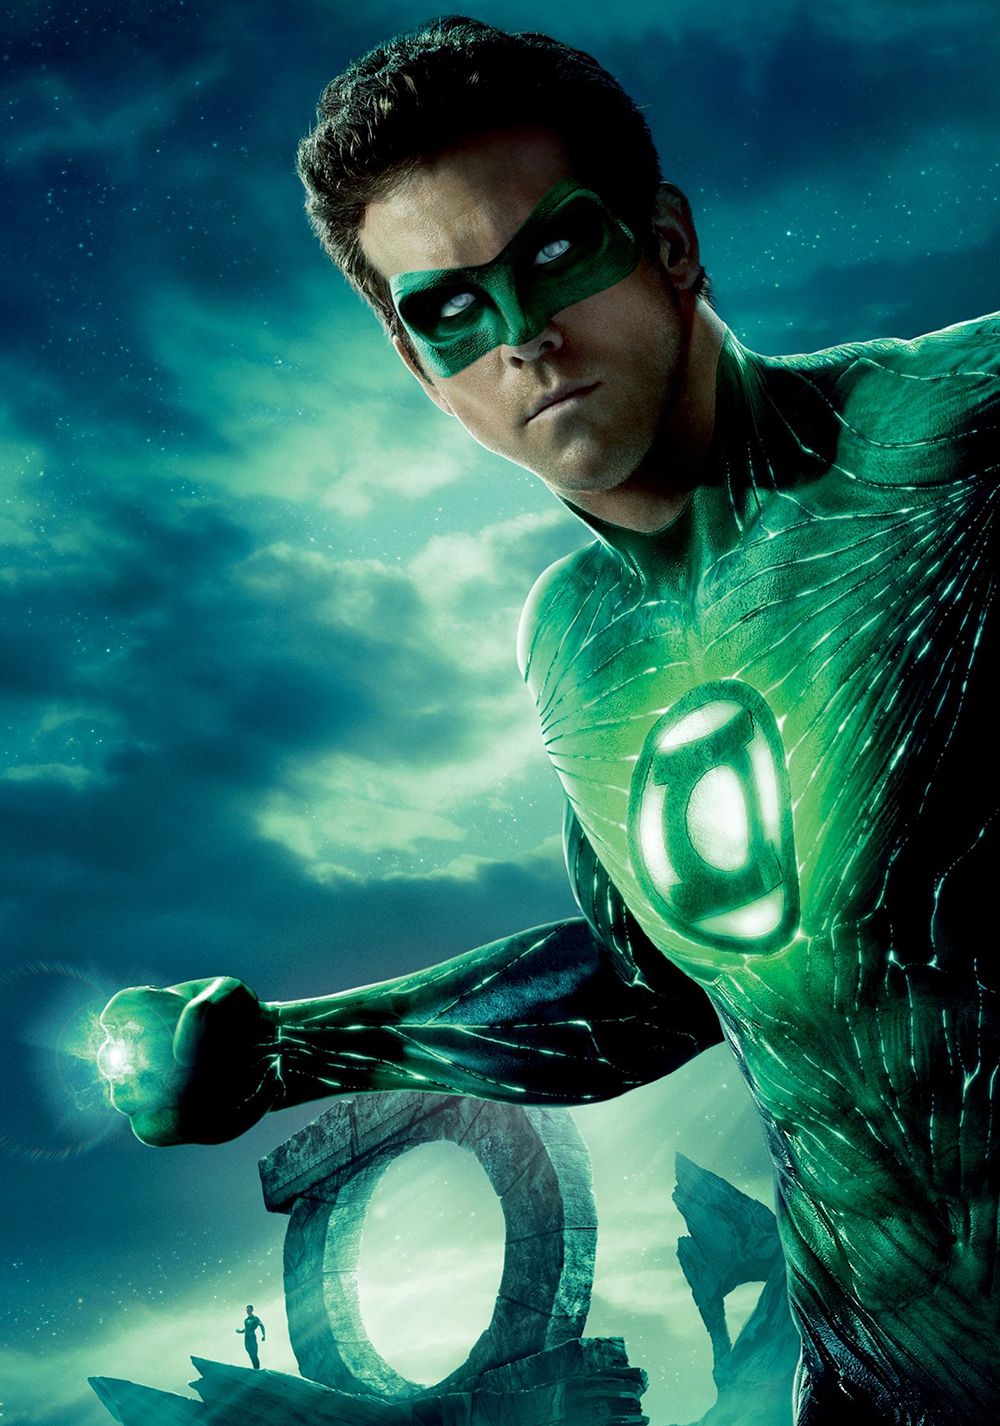 Green Lantern | Movie fanart | fanart.tv Green Lantern Movie Poster